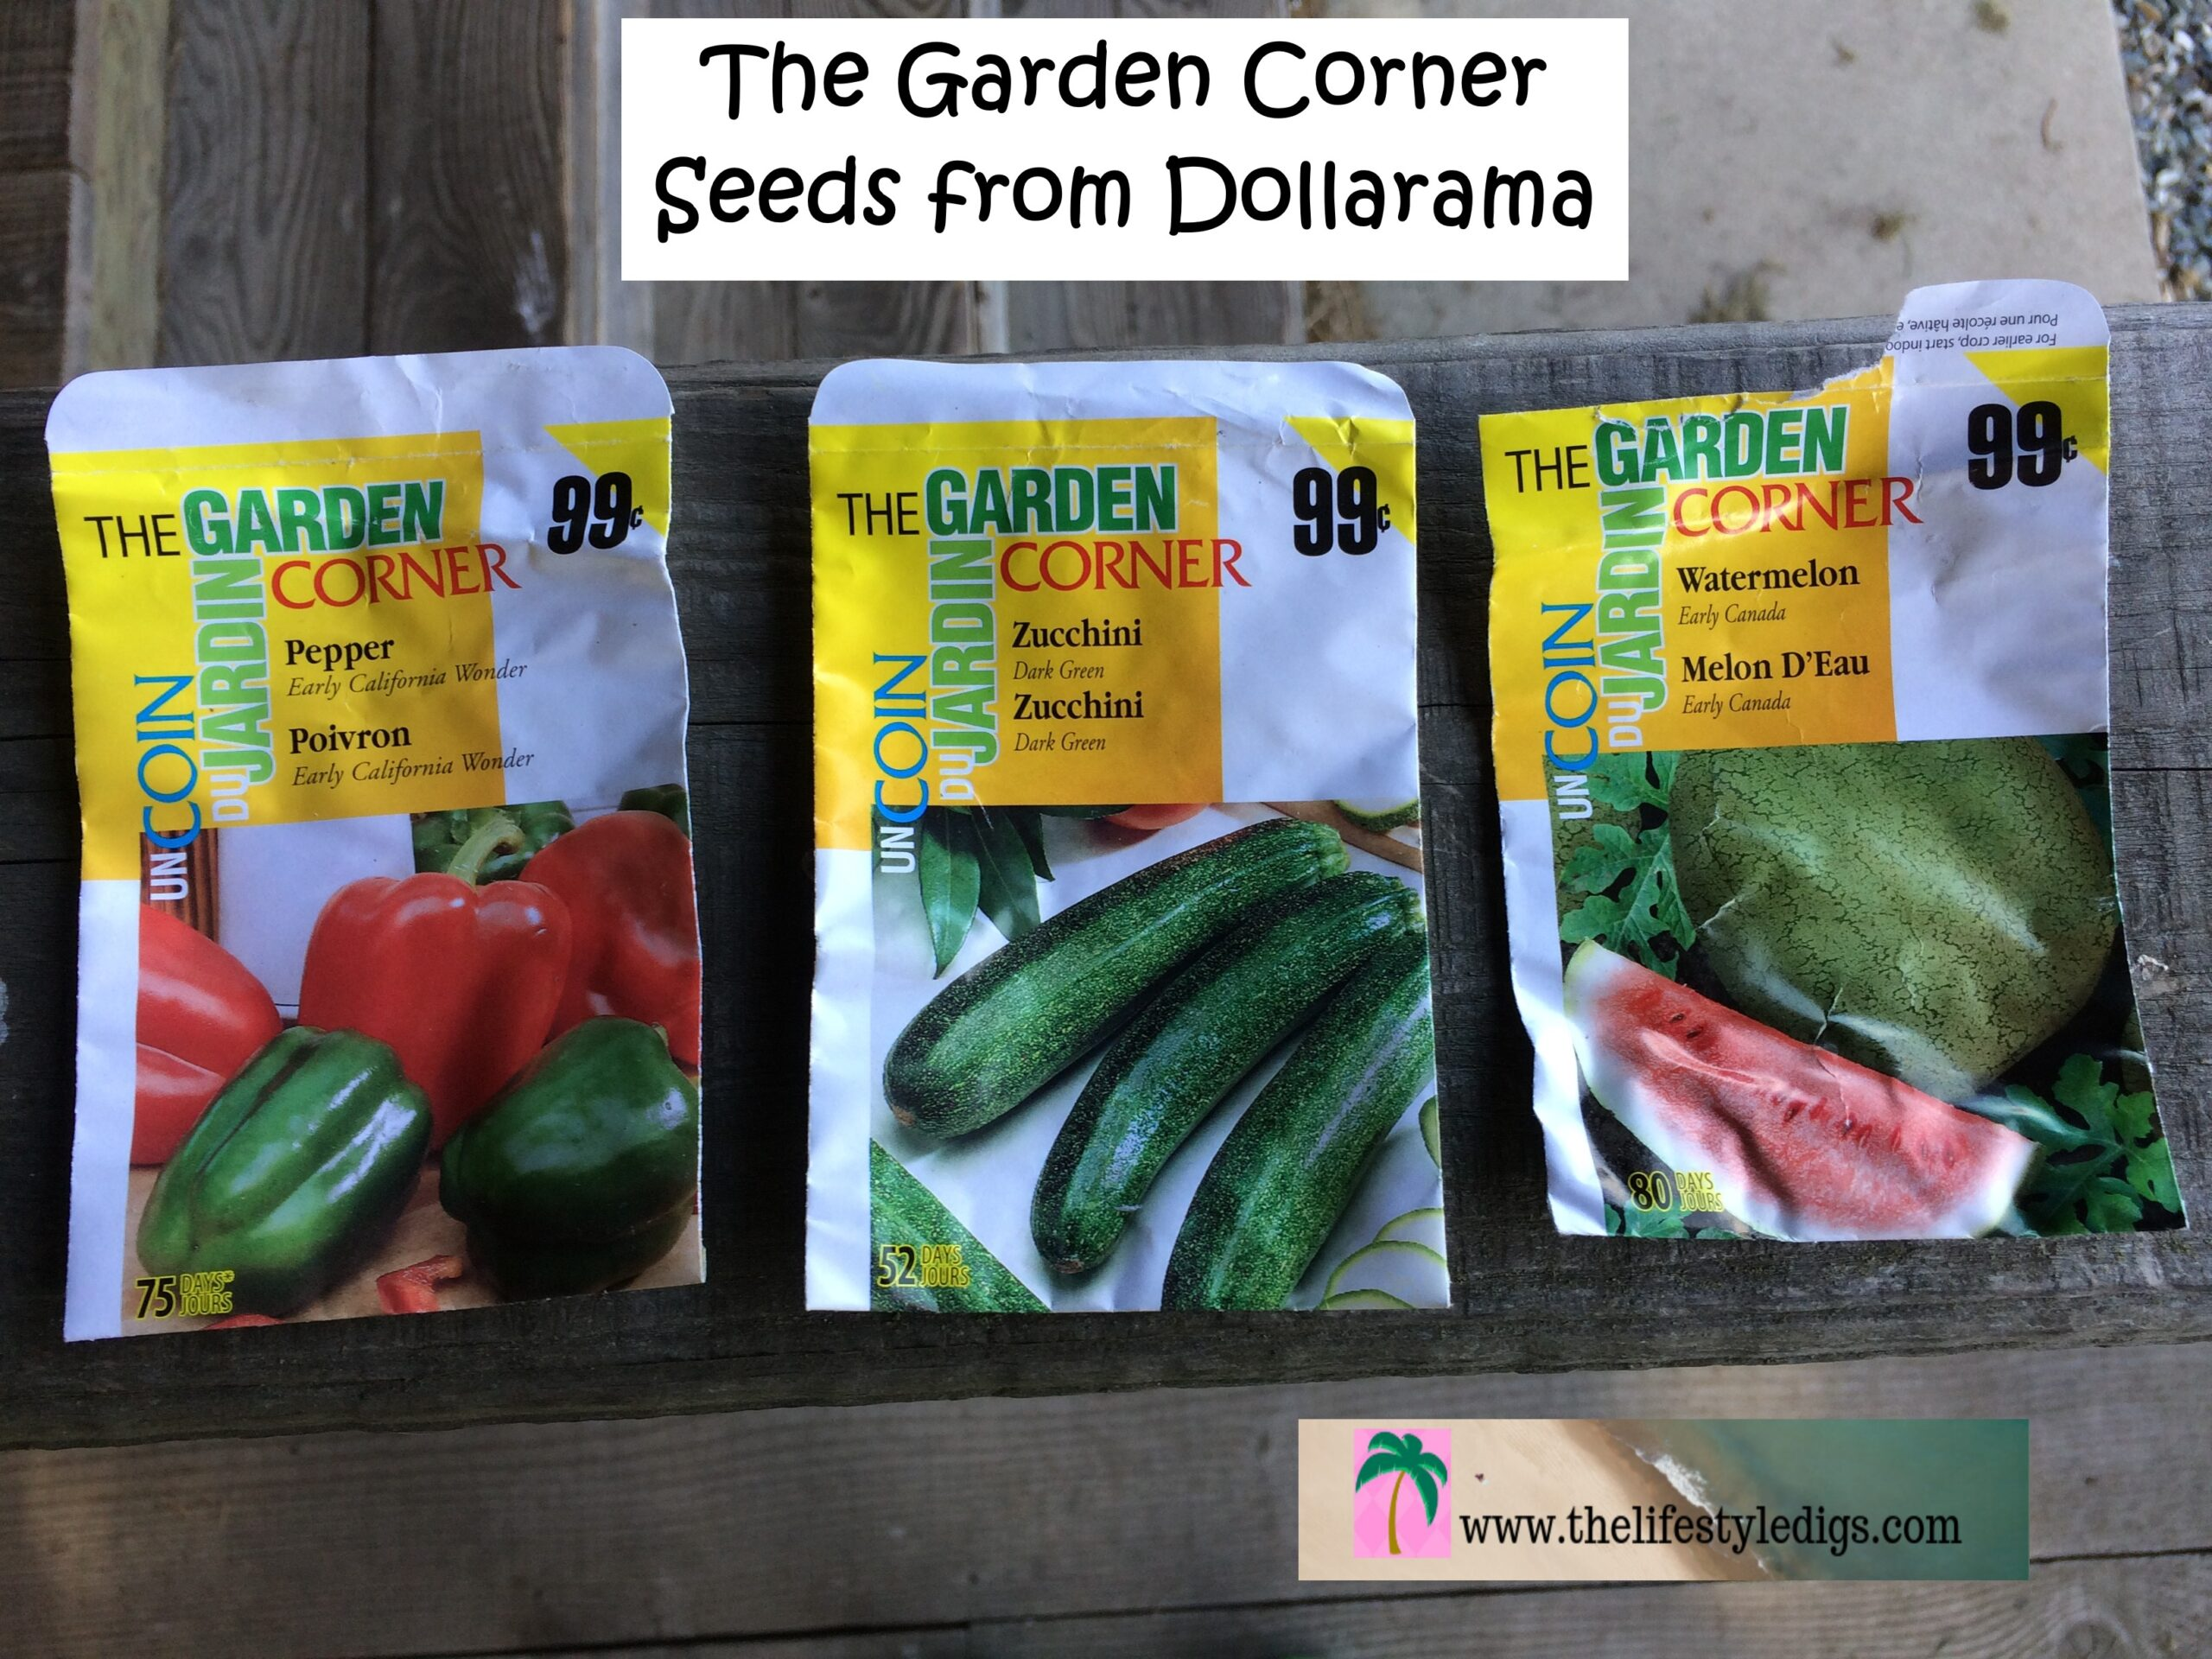 The Garden Corner Seeds from Dollarama